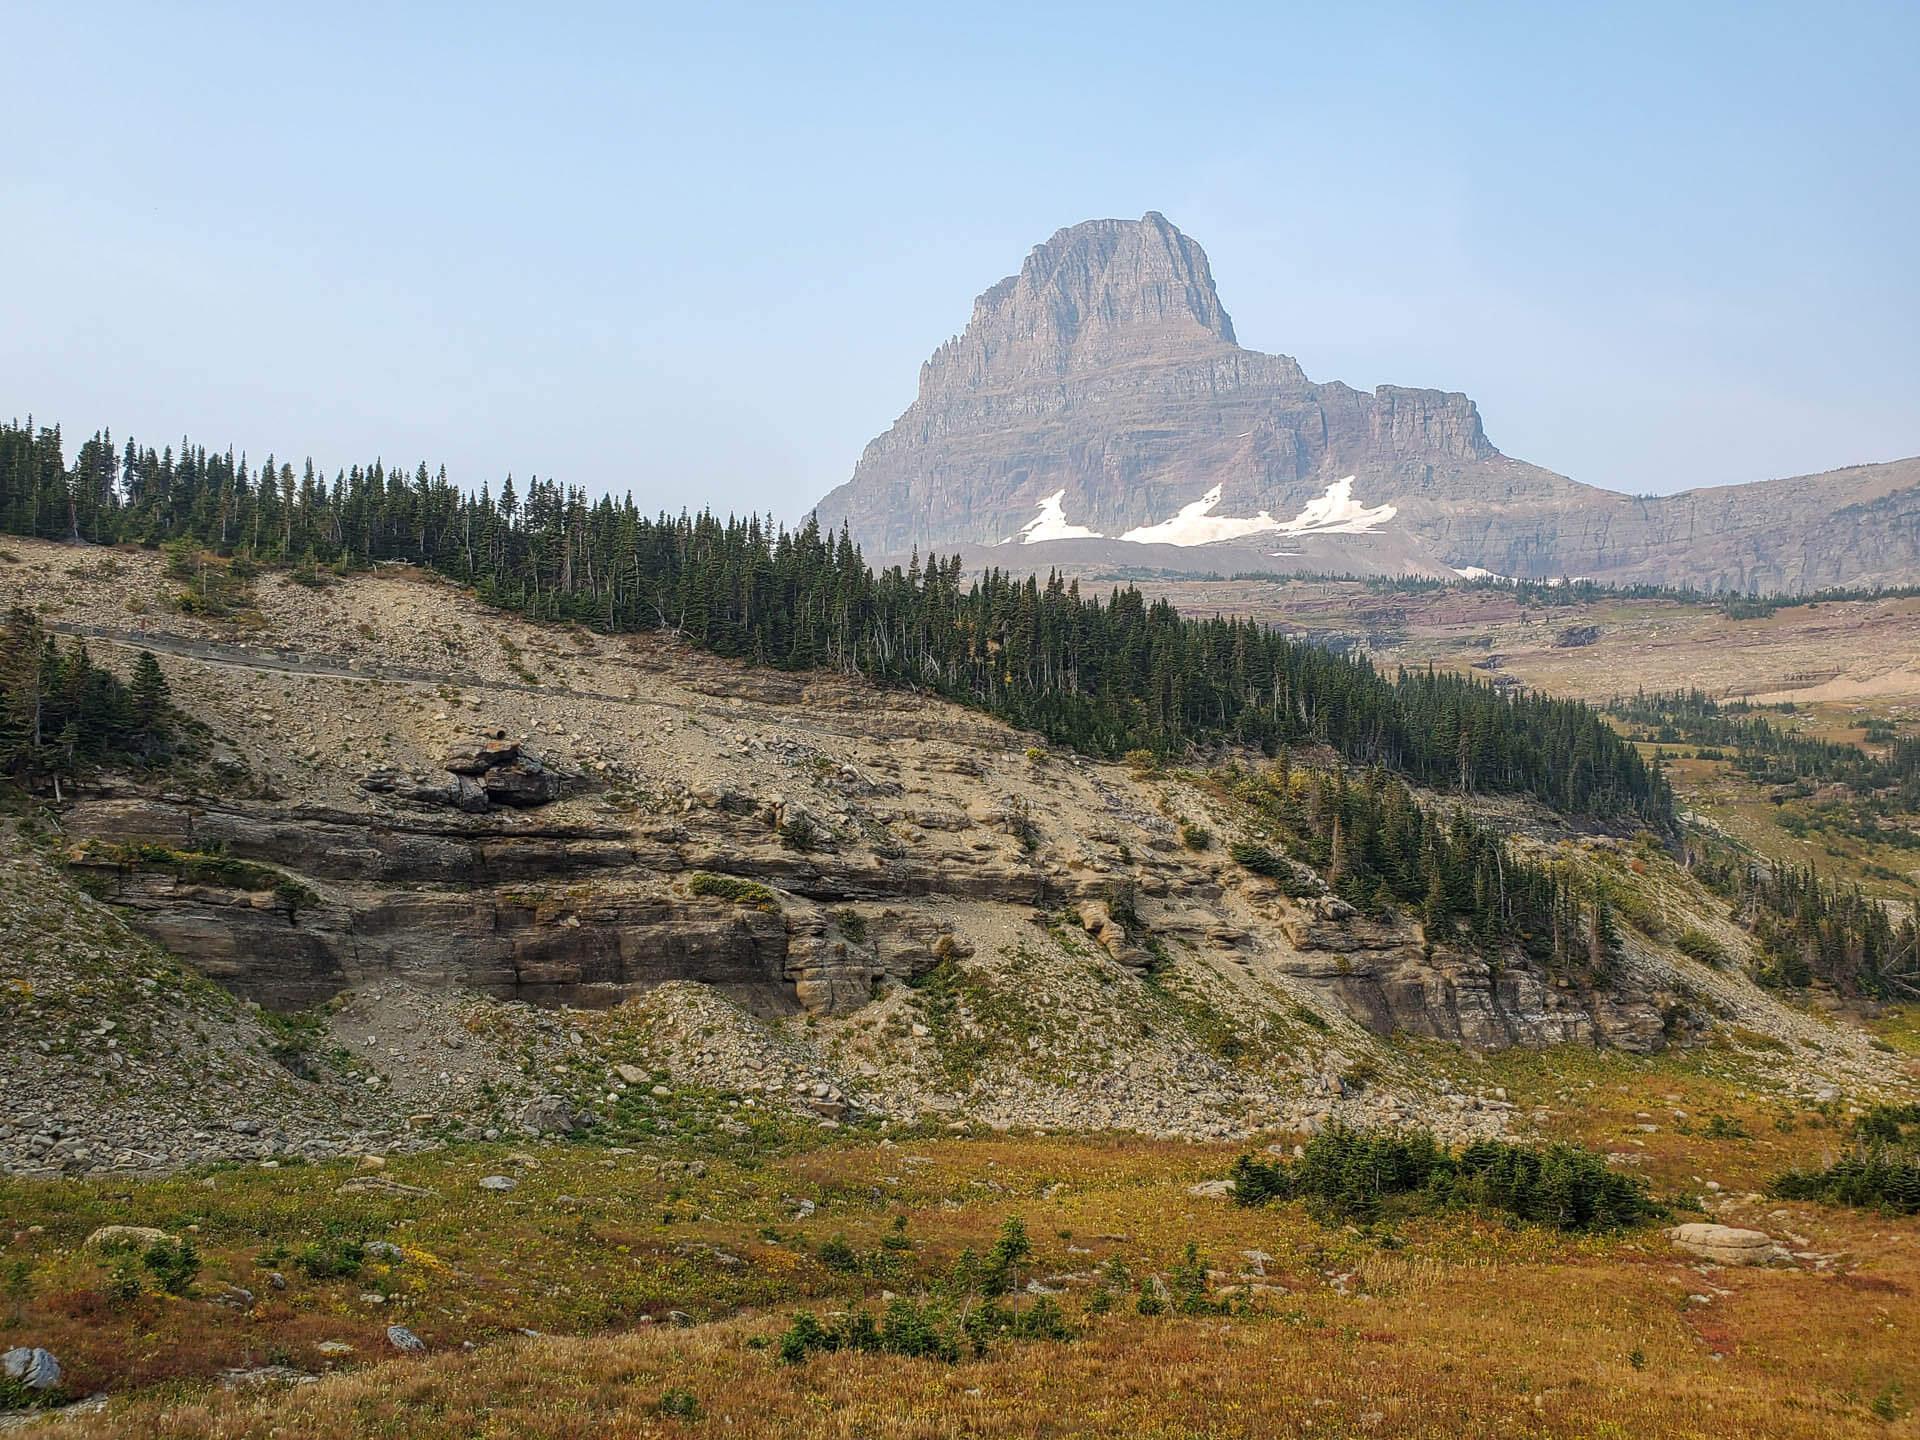 mountain peak with glaciers